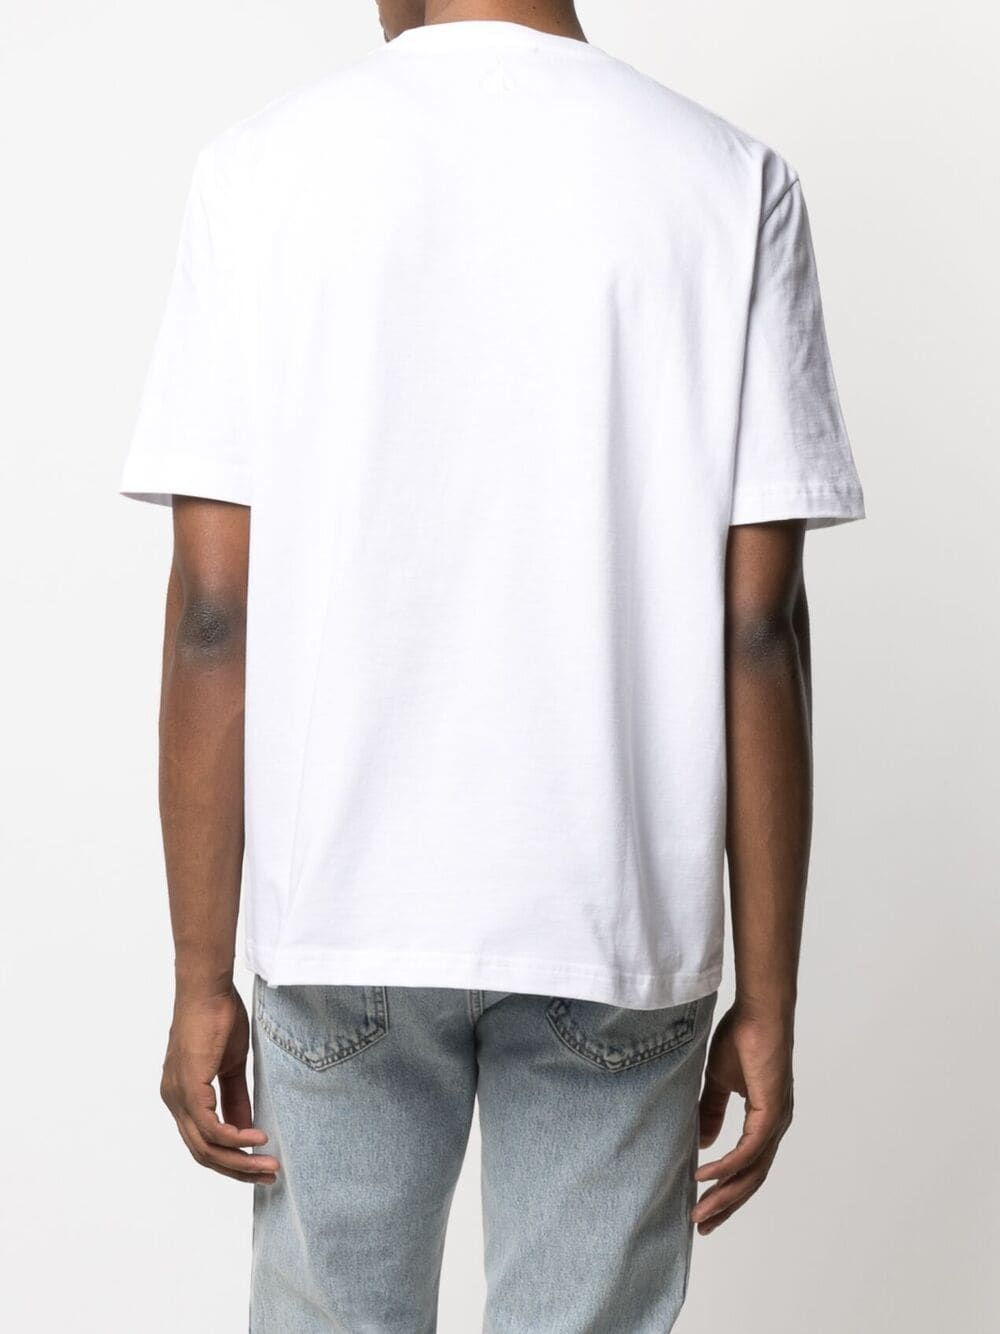 t-shirt con patch bocca uomo bianca in cotone LANVIN | T-shirt | RM-TS0002-J01501